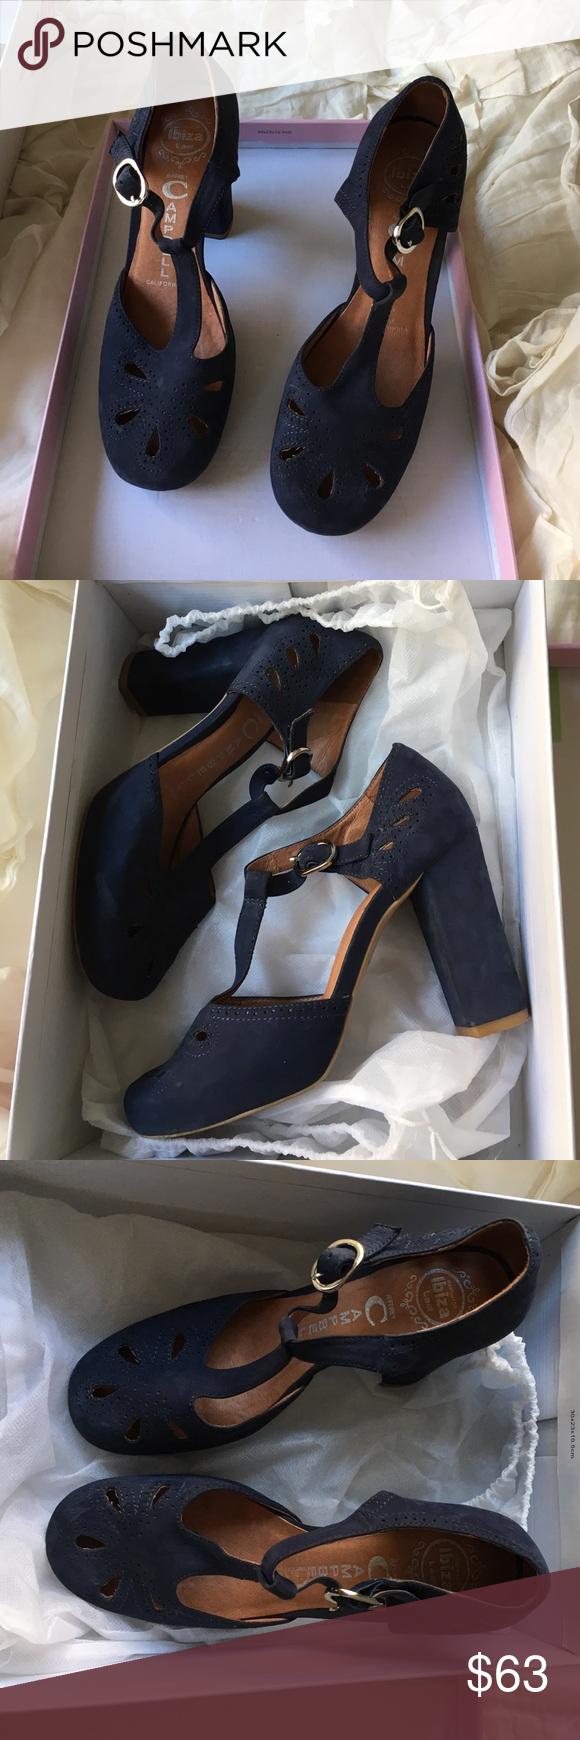 Jeffrey Campbell Maisie Navy Nubuck Jeffrey Campbell Maisie Navy Nubuck Handmade Ibiza Last size 6 Jeffrey Campbell Shoes Heels